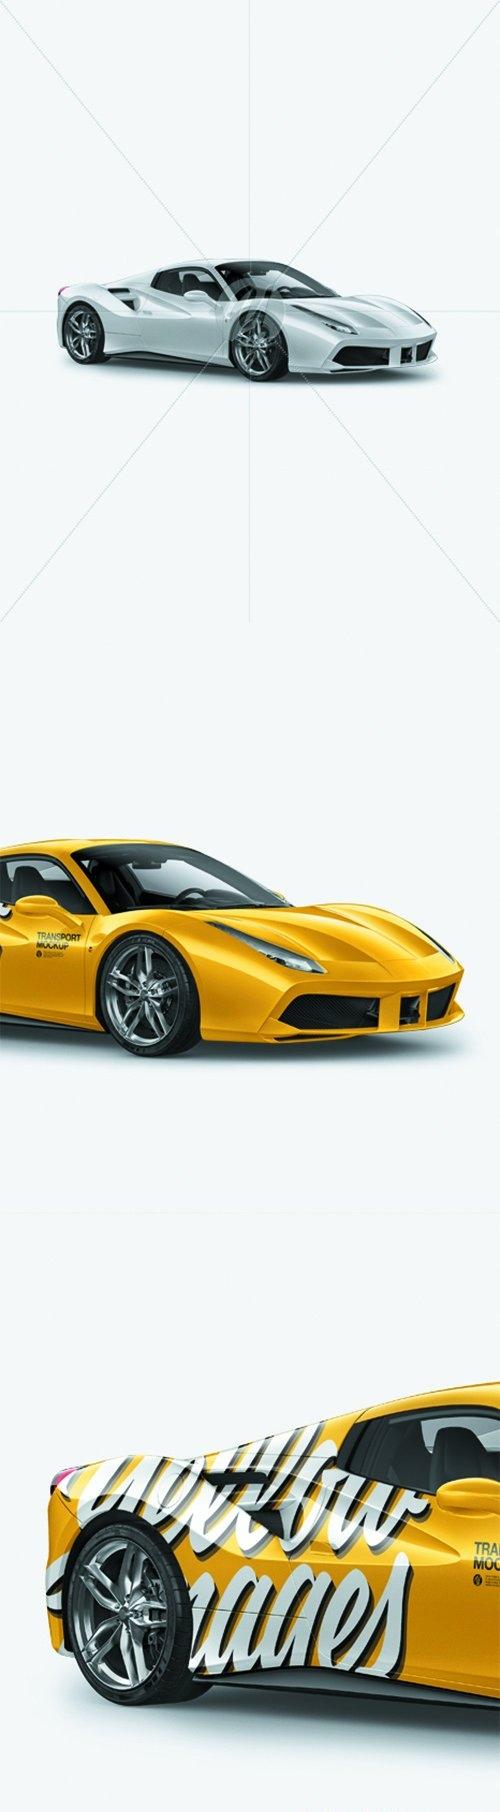 Ferrari 488 Mockup - Half Side View 25751